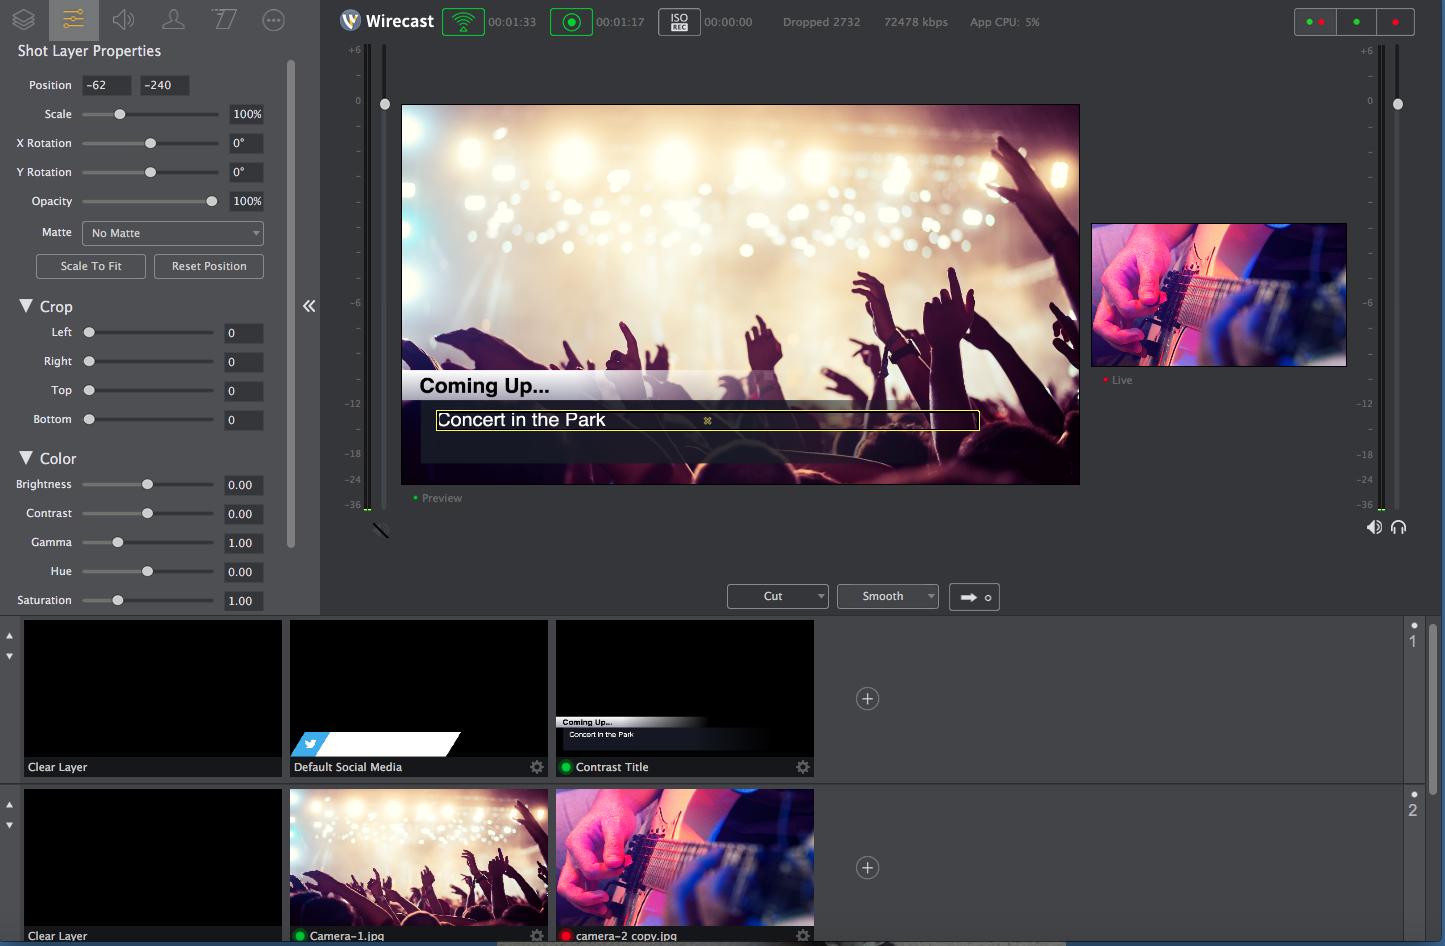 Wirecast screenshot